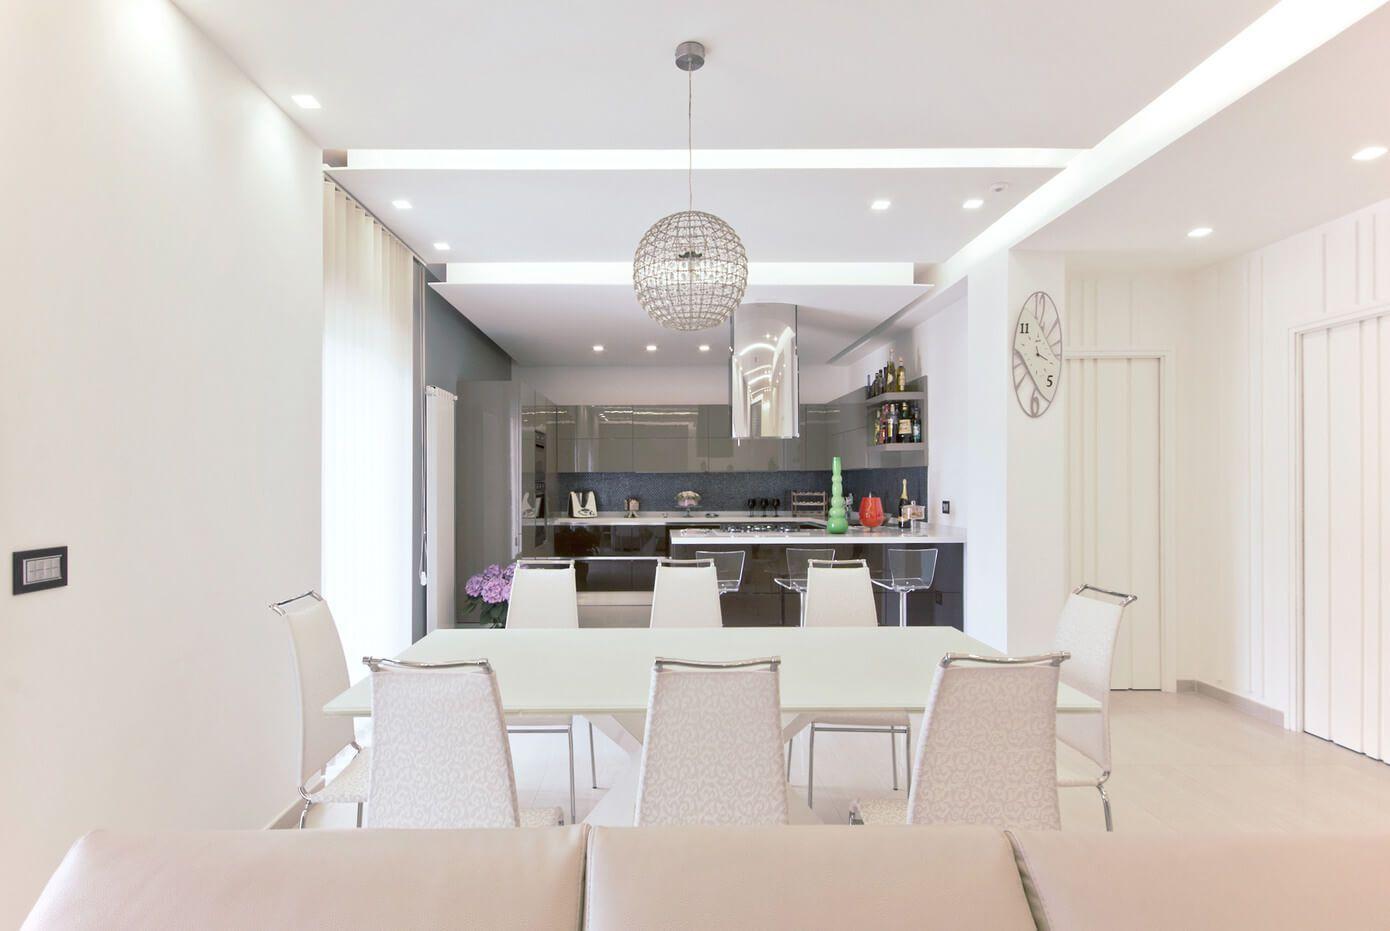 Interior-I--by-b2c-architects-01